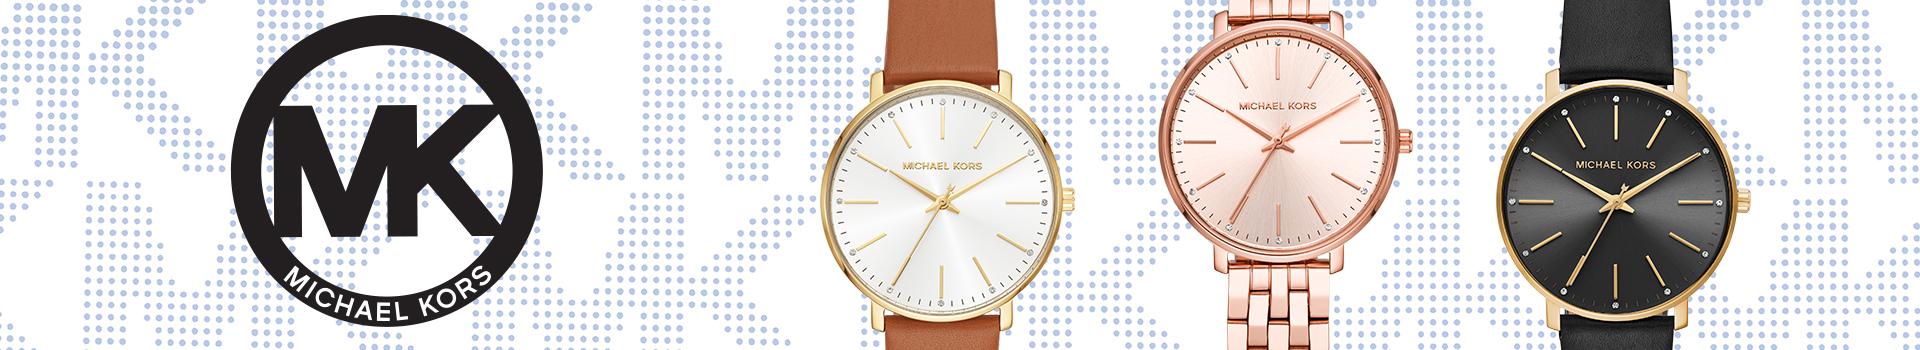 Banner relojes MichaelKors Cristal Joyas